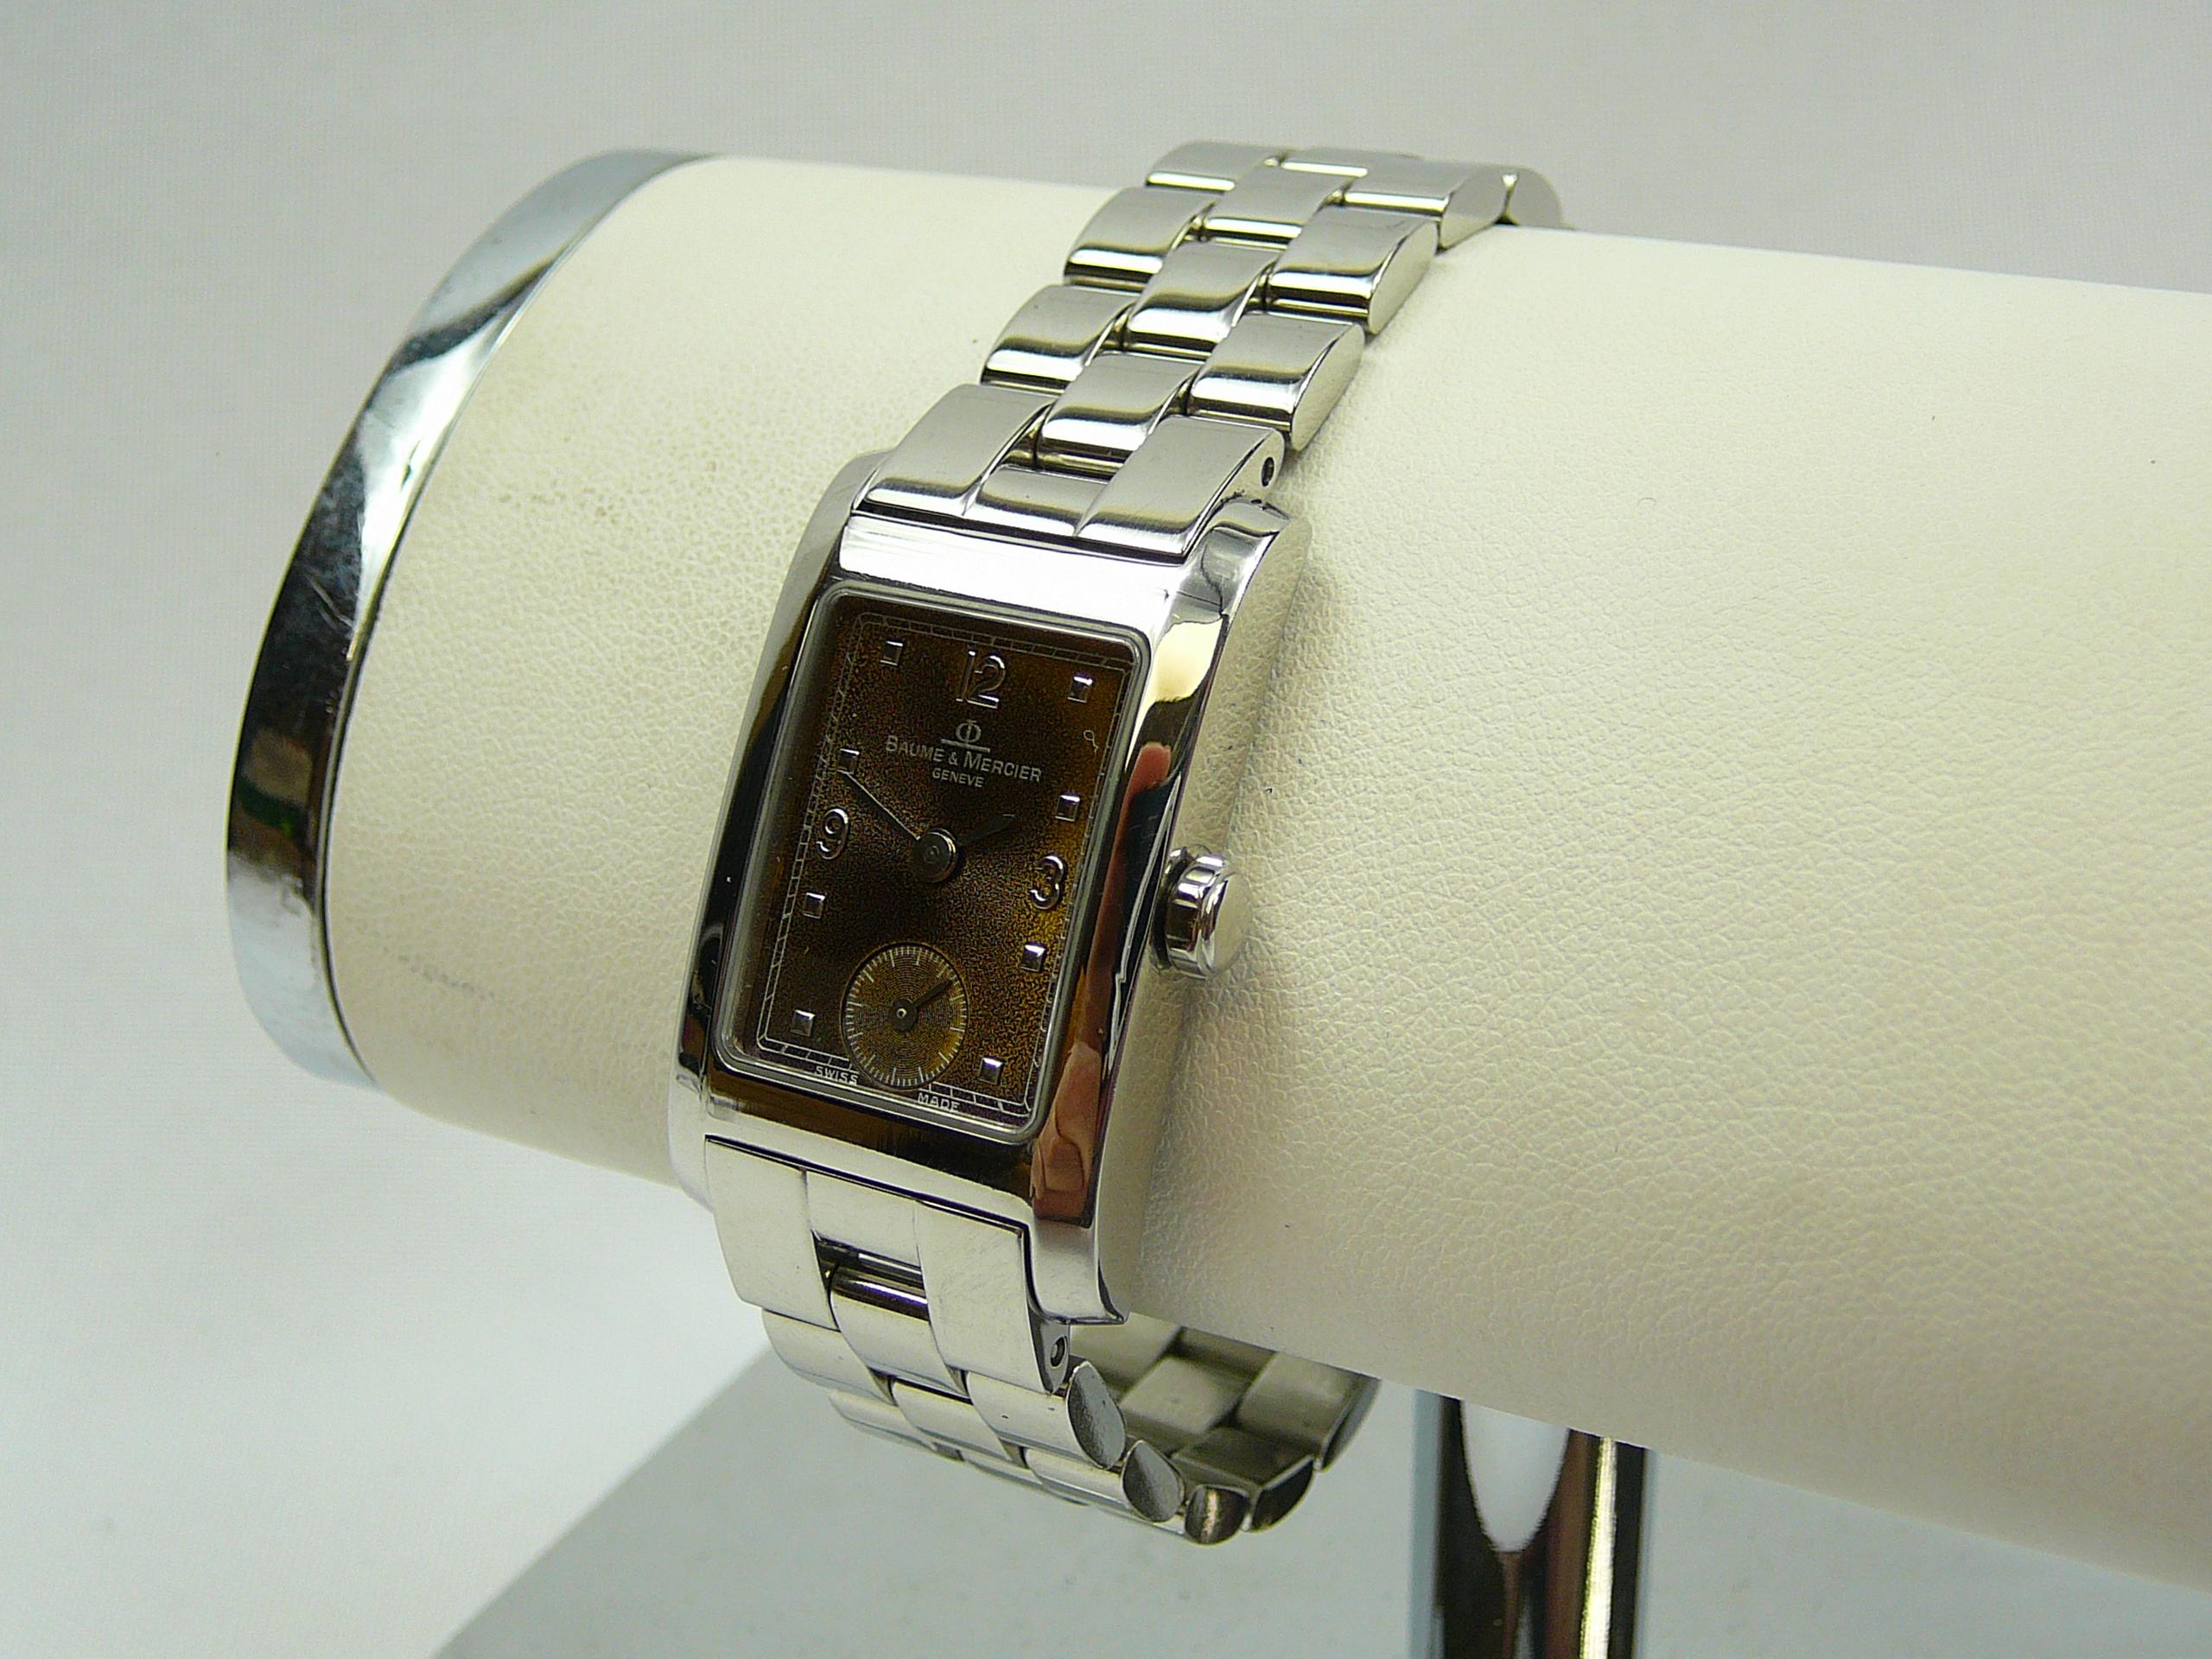 Ladies Baume & Mercier Wrist Watch